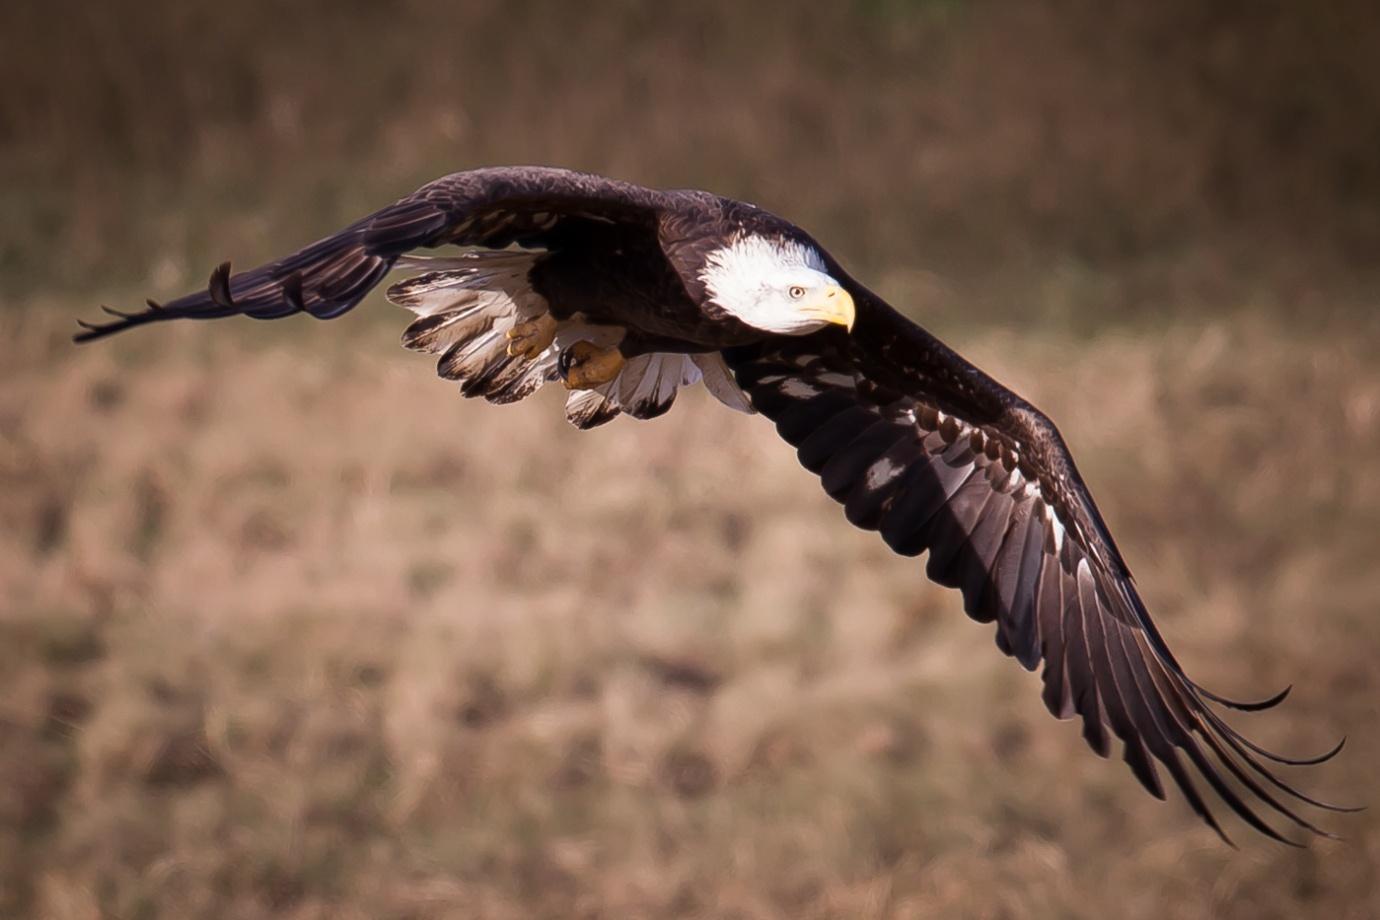 white-oak-pastures-bald-eagles-123.jpg